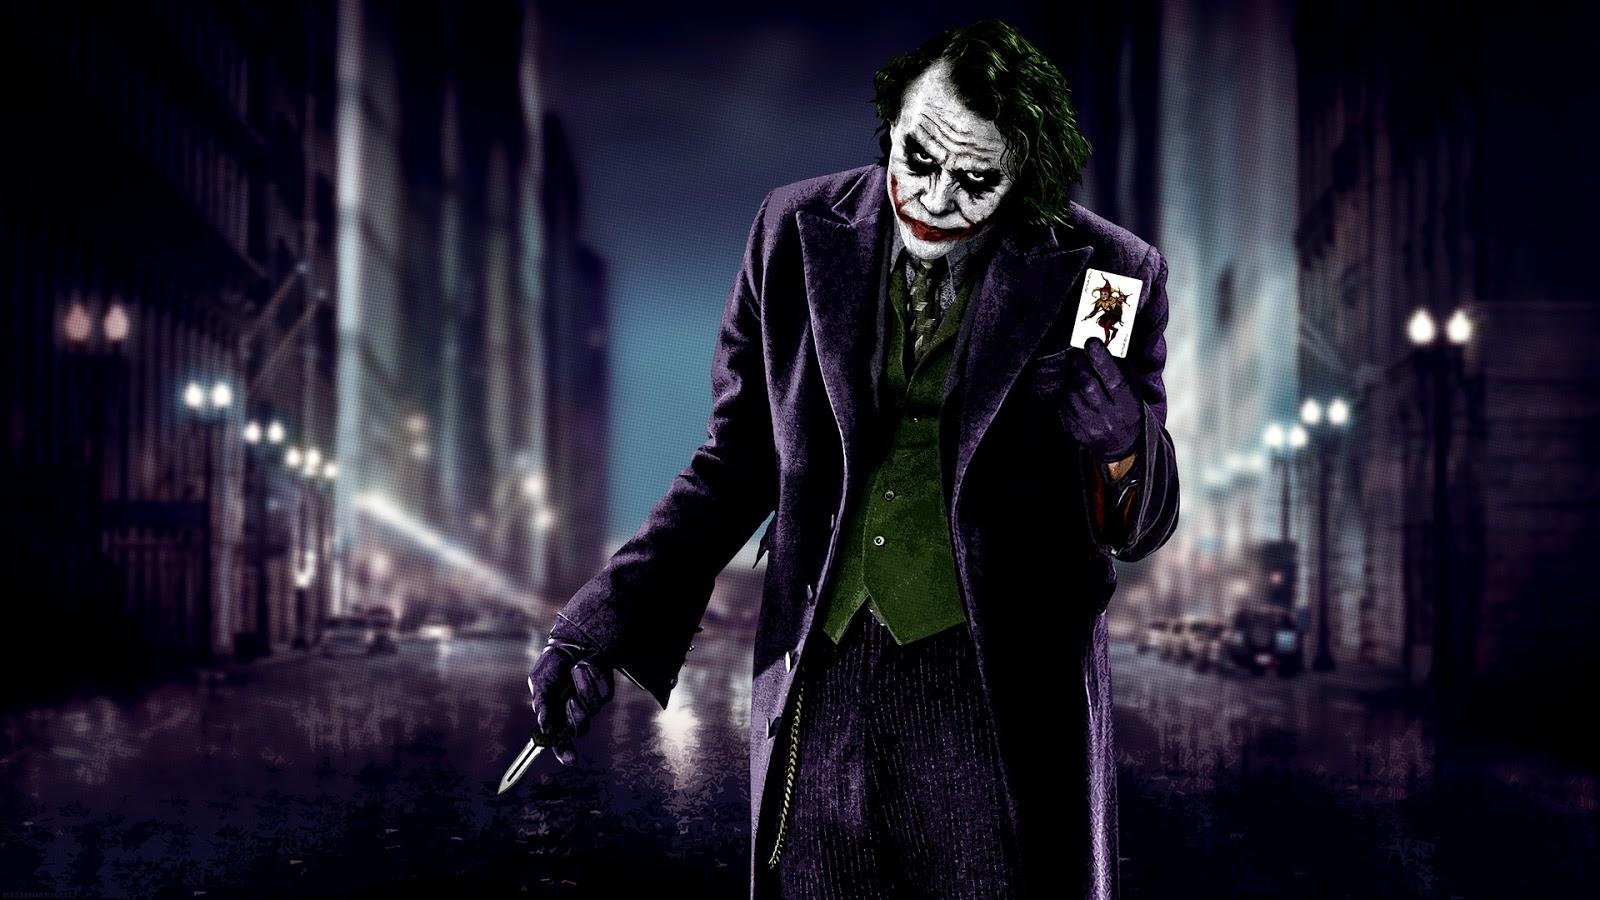 heath ledger joker - photo #37